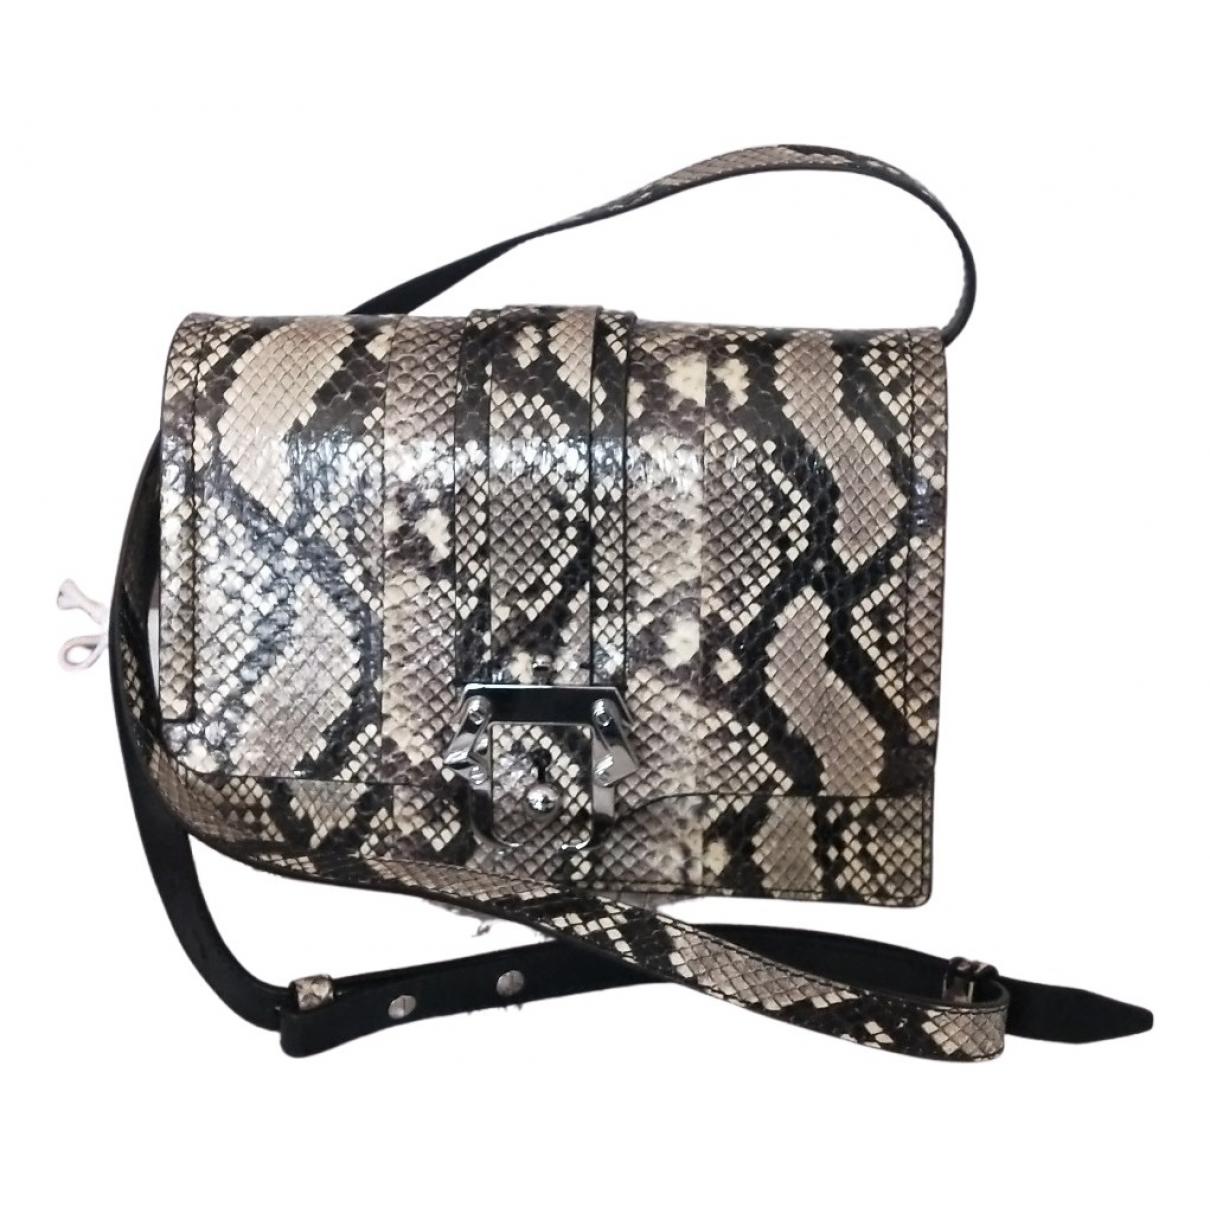 Paula Cademartori N Beige Python handbag for Women N